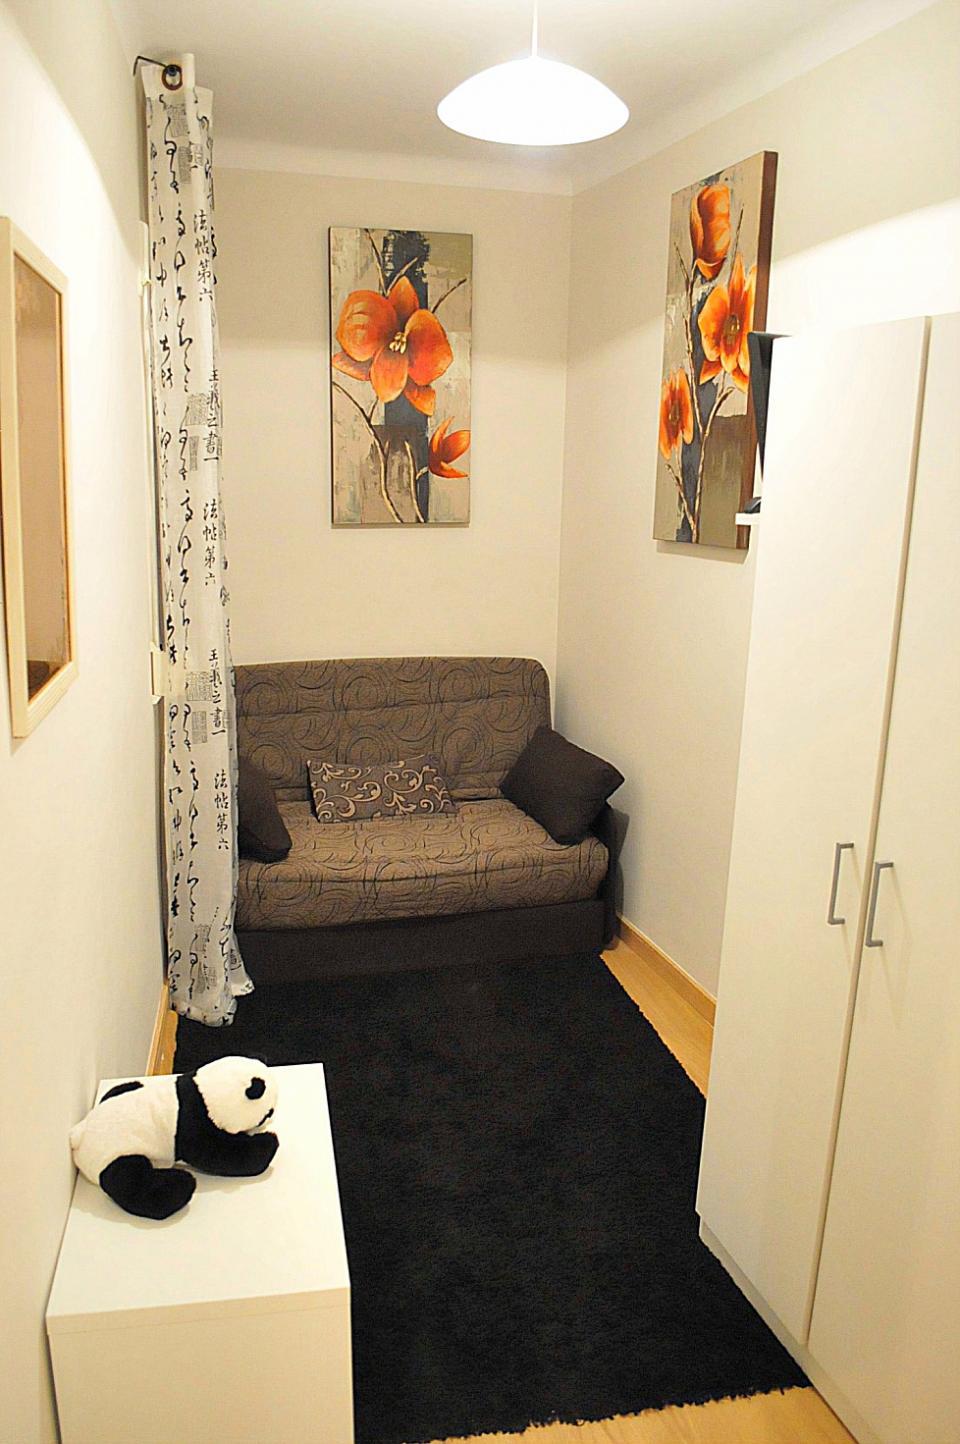 Habitaci n en alquiler plaza espa a barcelona home for Alojamiento en barcelona espana